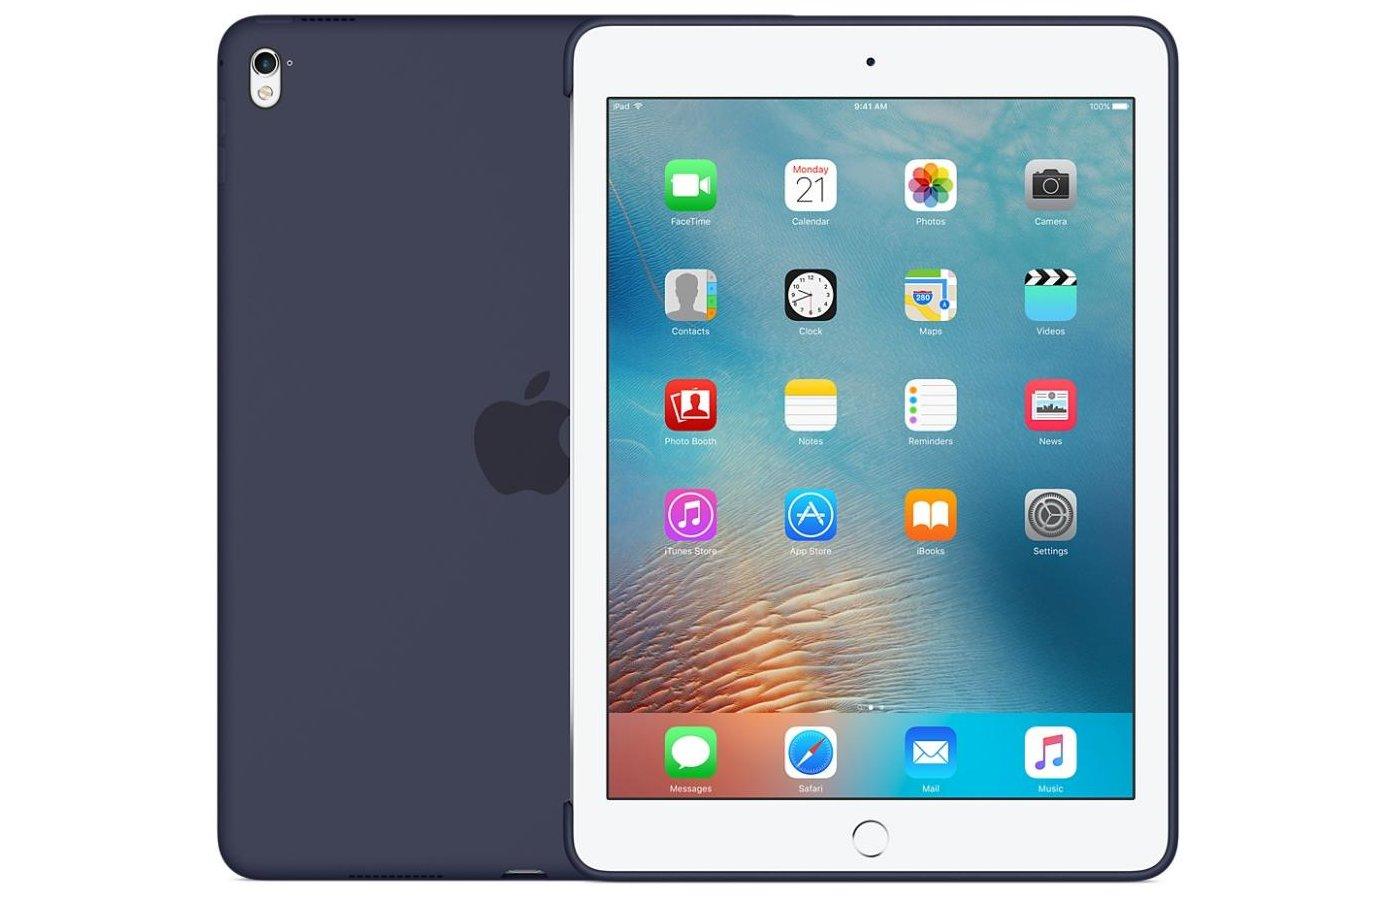 Чехол для планшетного ПК Apple Silicone Case iPad Pro 9.7 - Midnight Blue (MM212ZM/A)